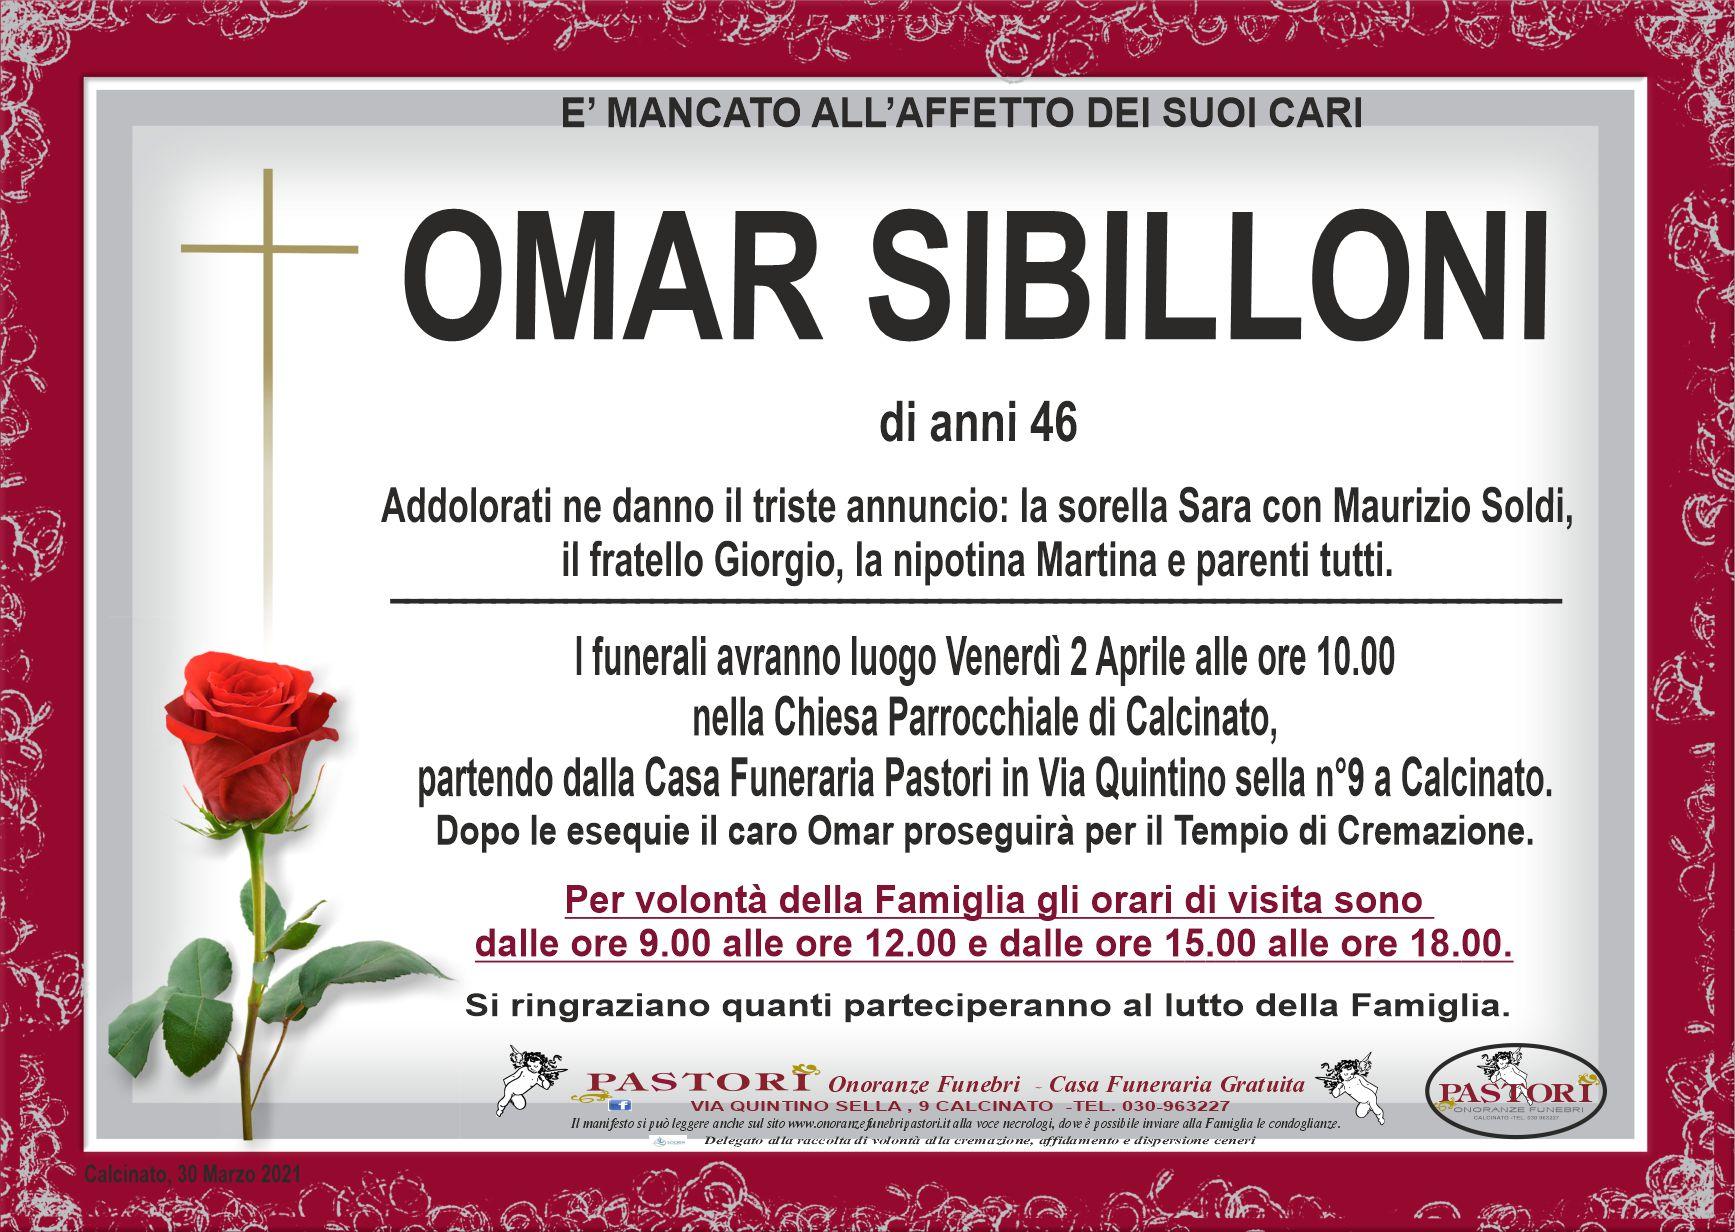 Omar Sibilloni